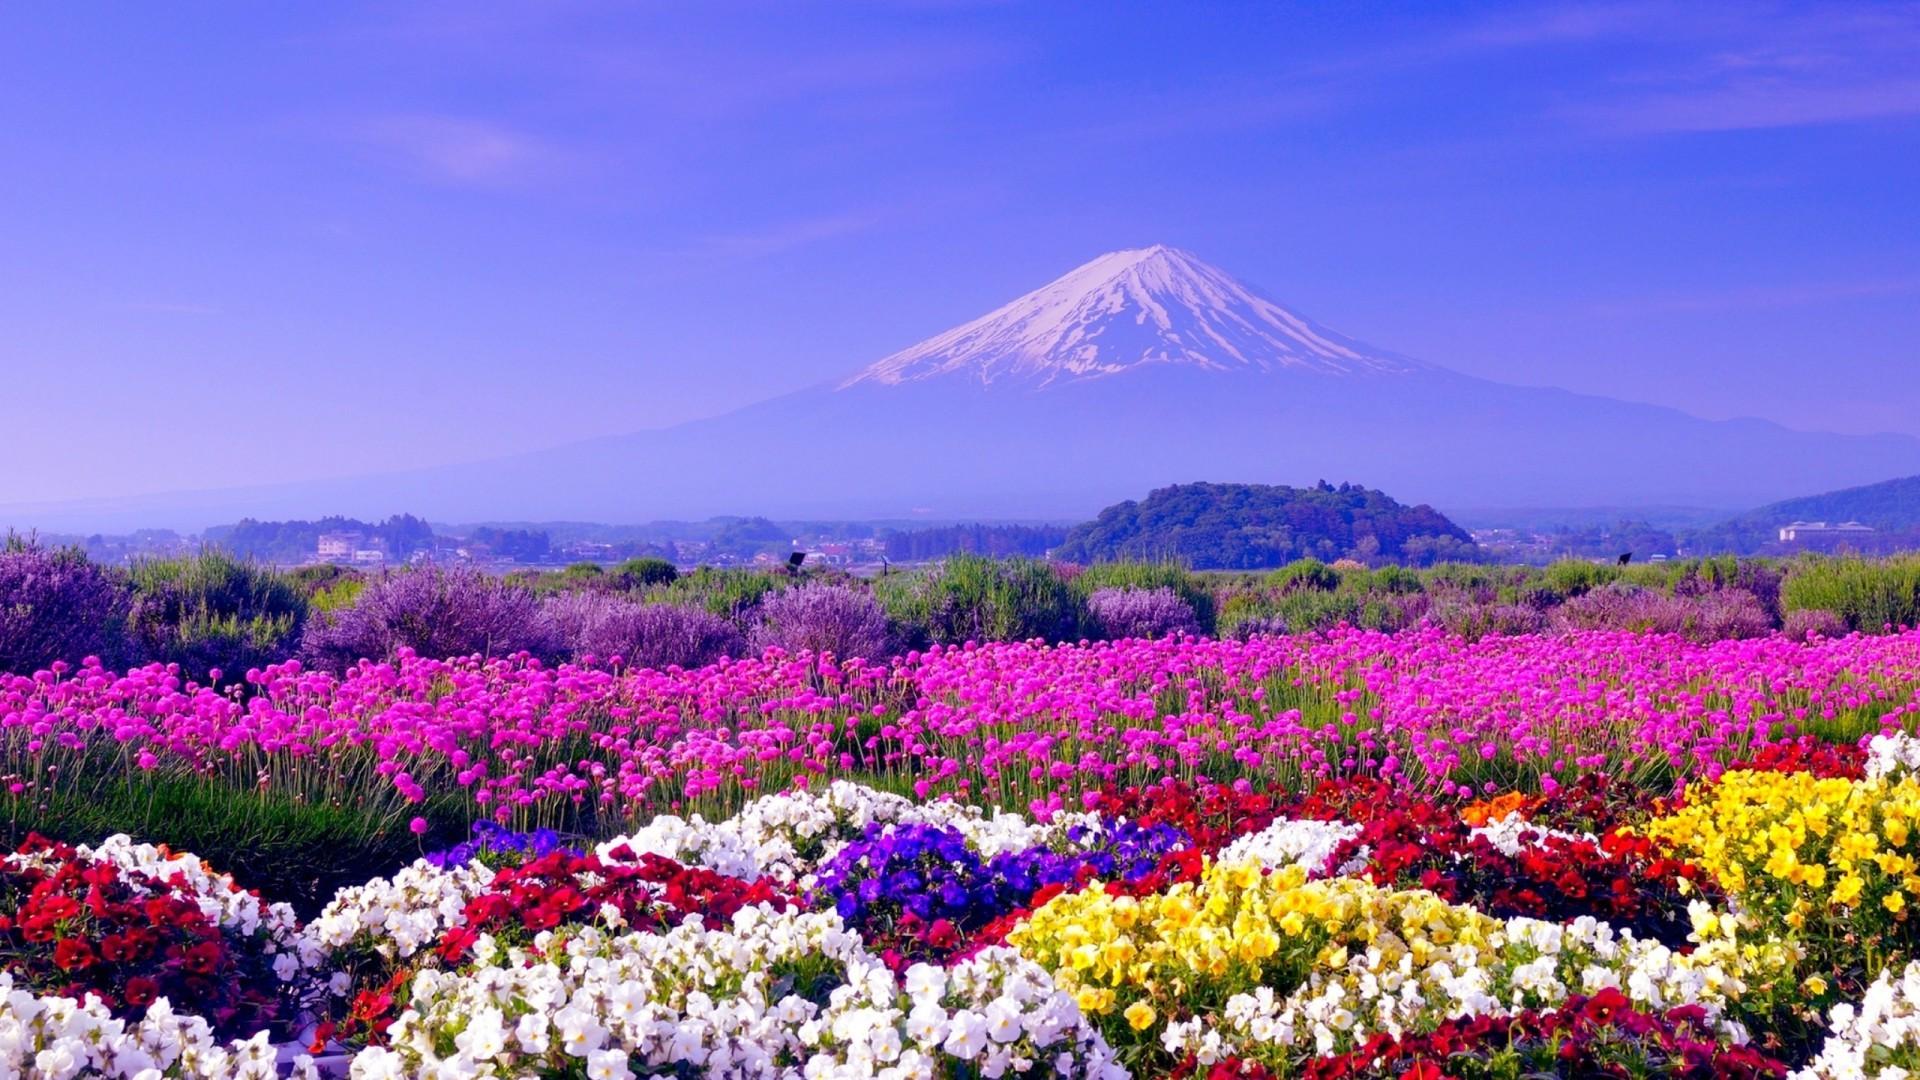 Res: 1920x1080, spring in japan wallpaper hd free download Wallpaper HD